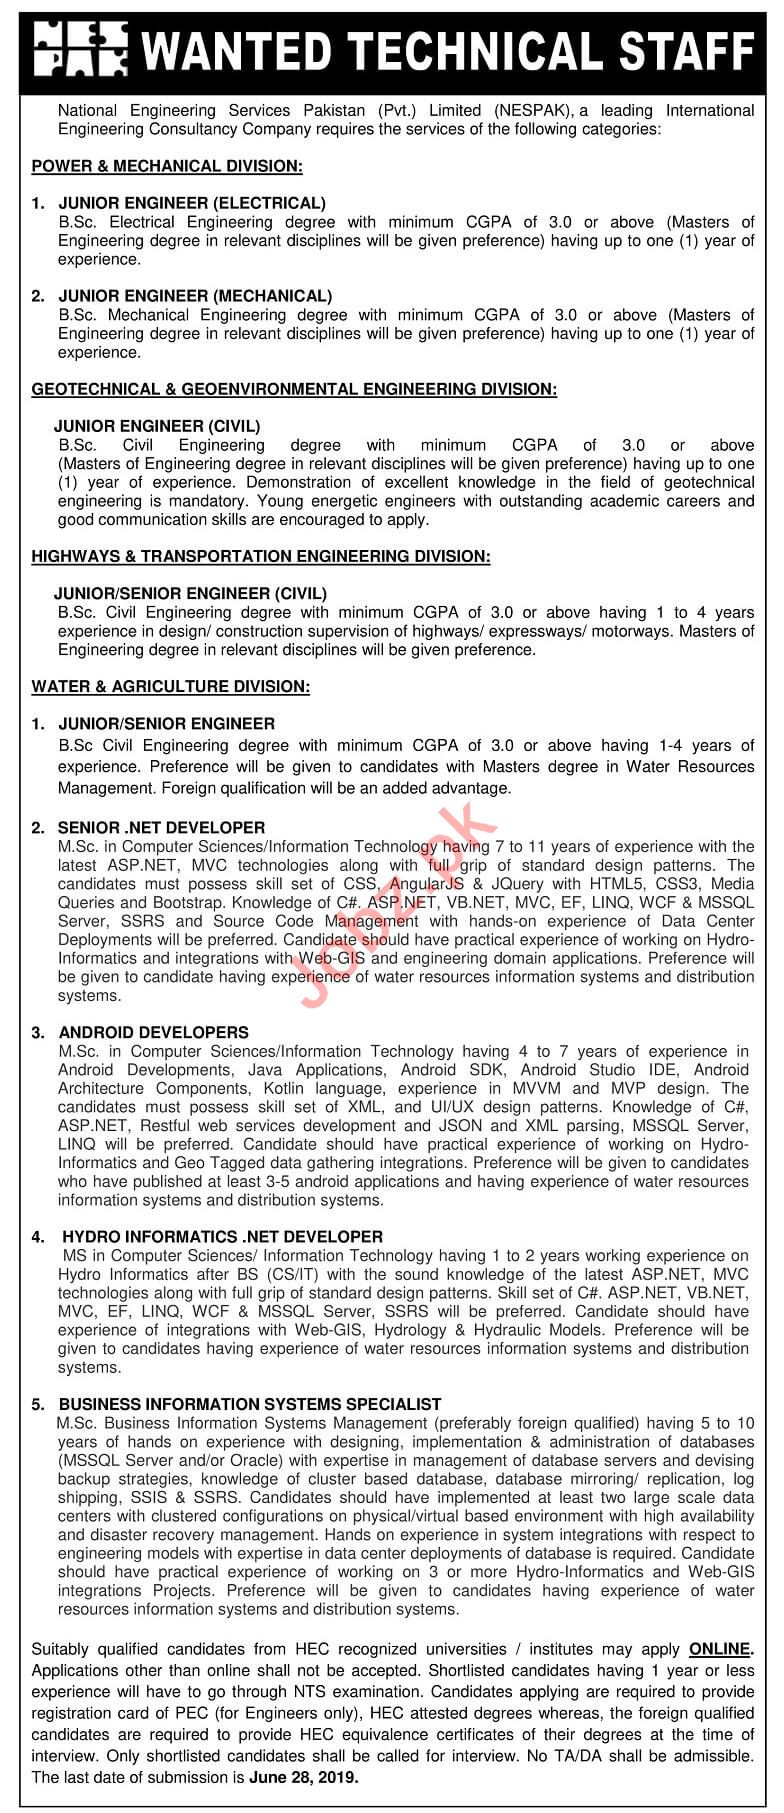 National Engineering Services Pakistan NESPAK Engineers Jobs